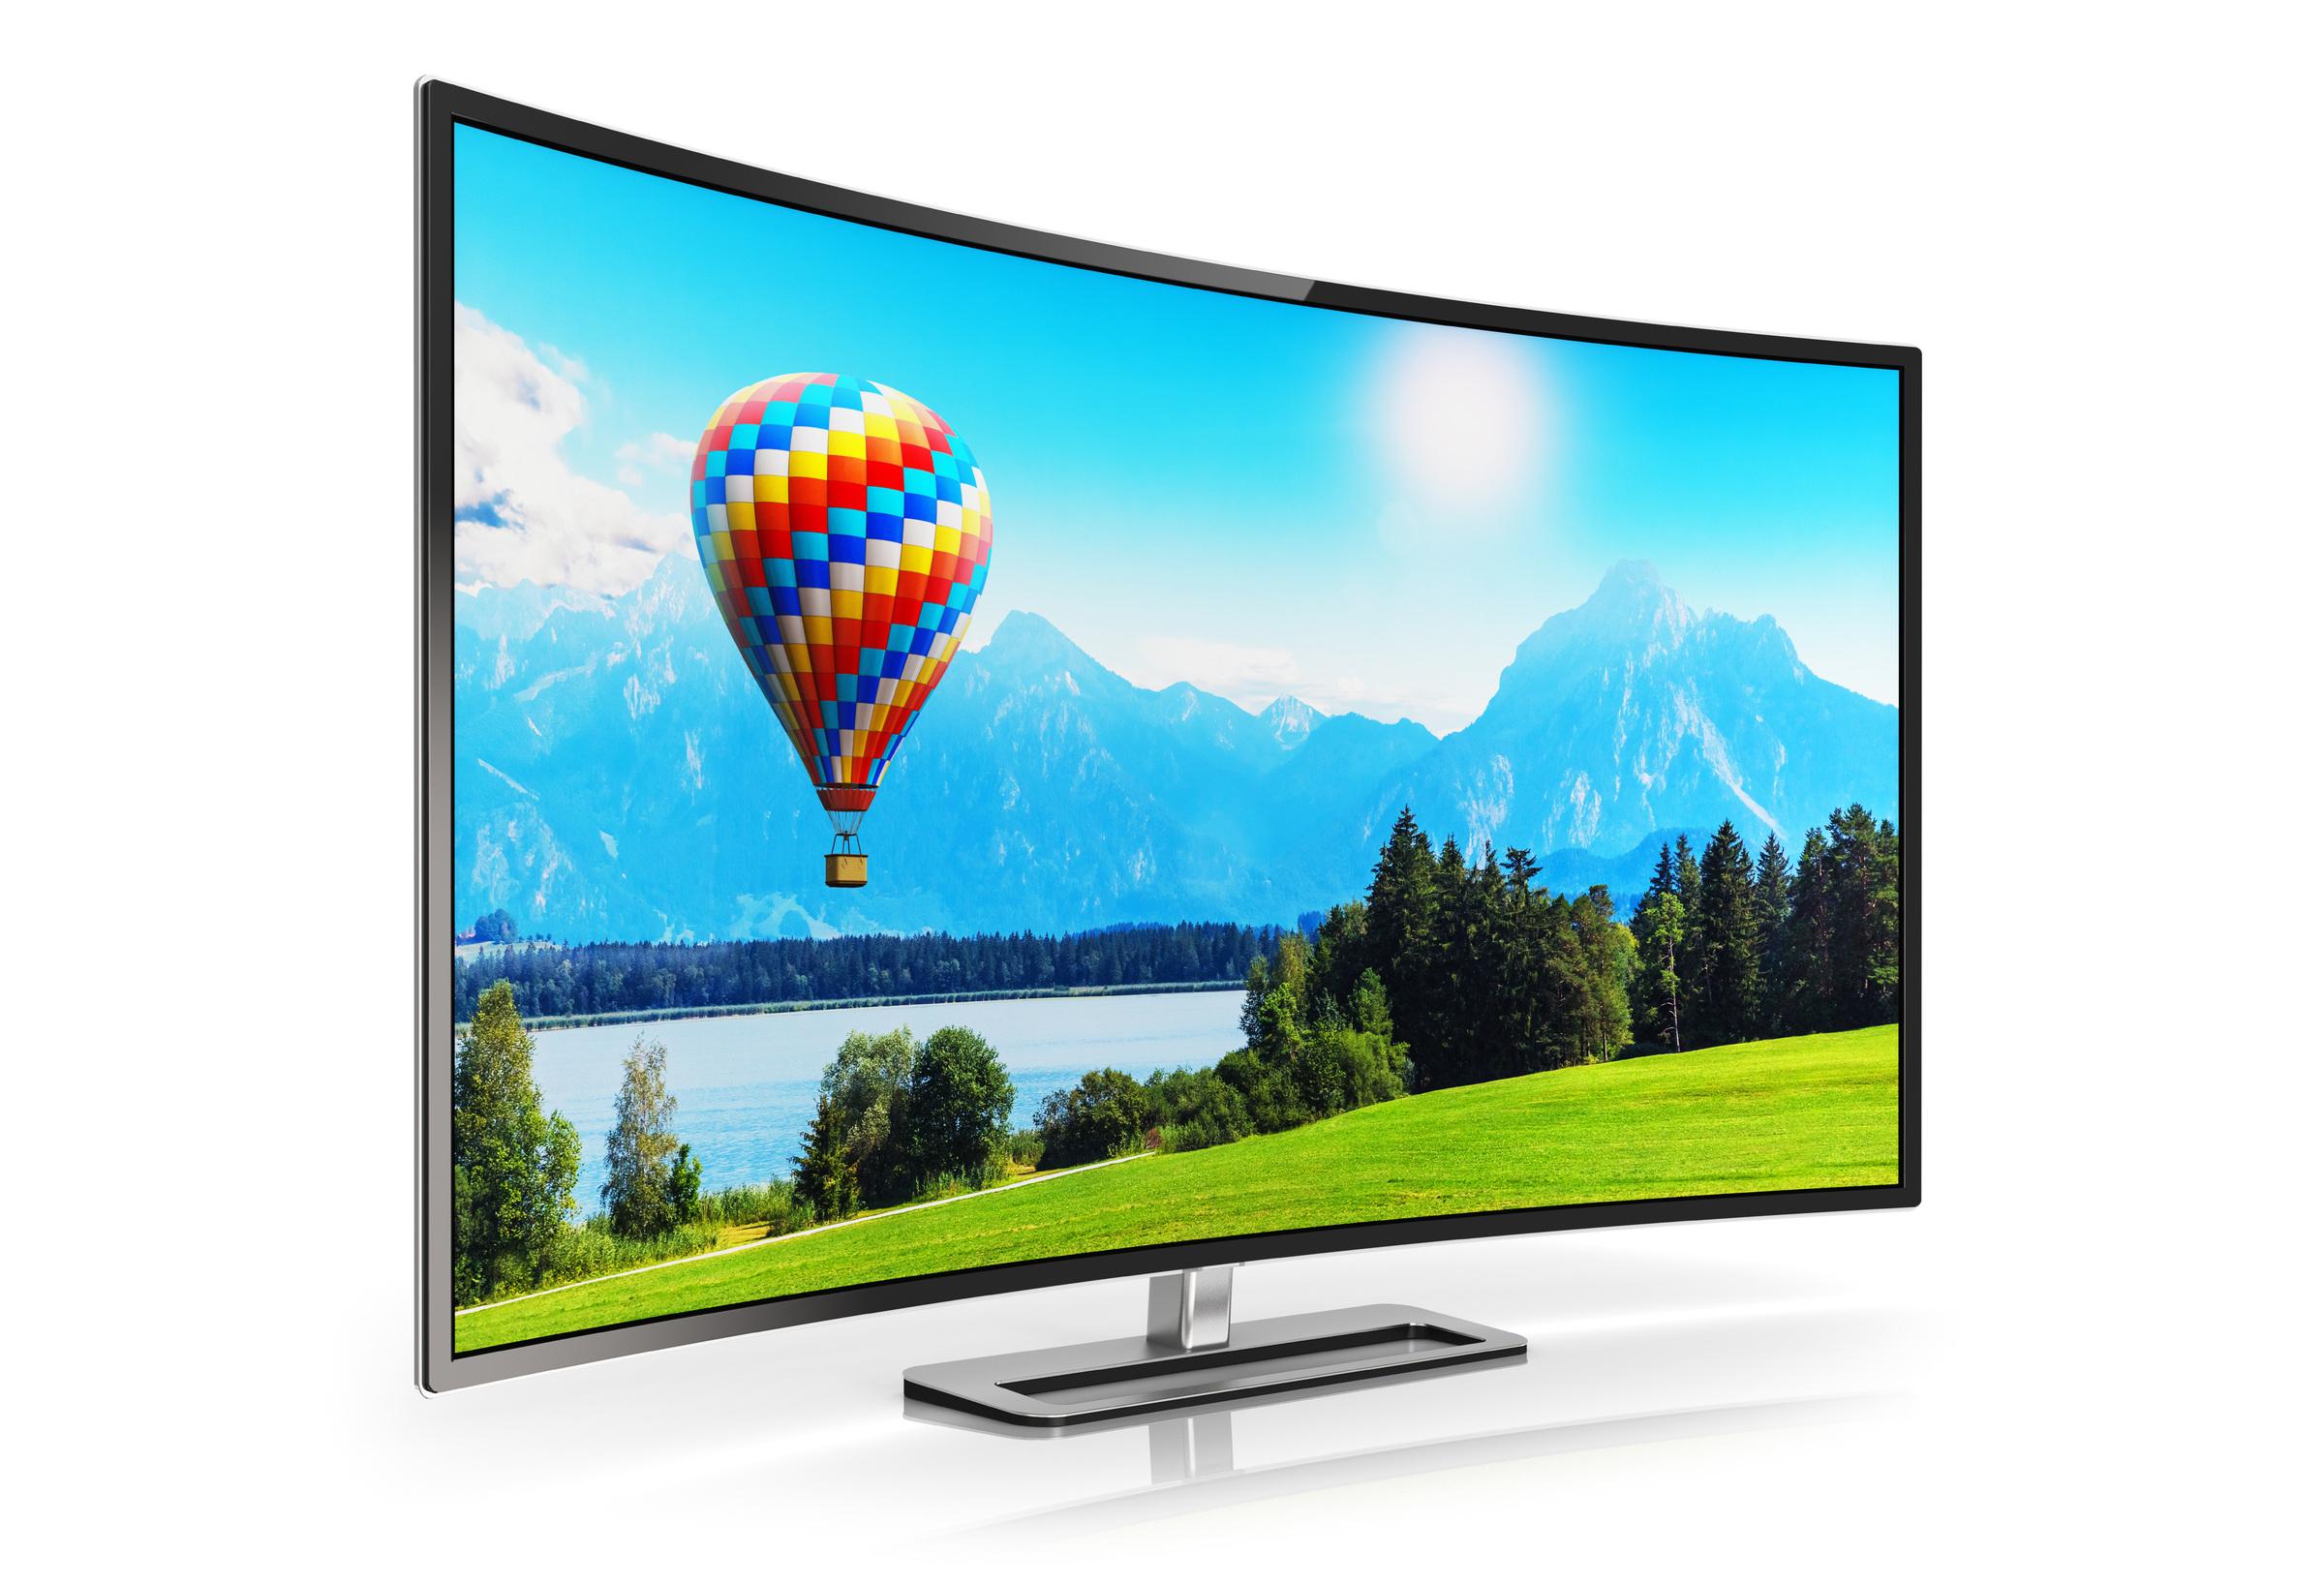 Better Buy Corning Inc Vs Universal Display Corp The Motley Fool